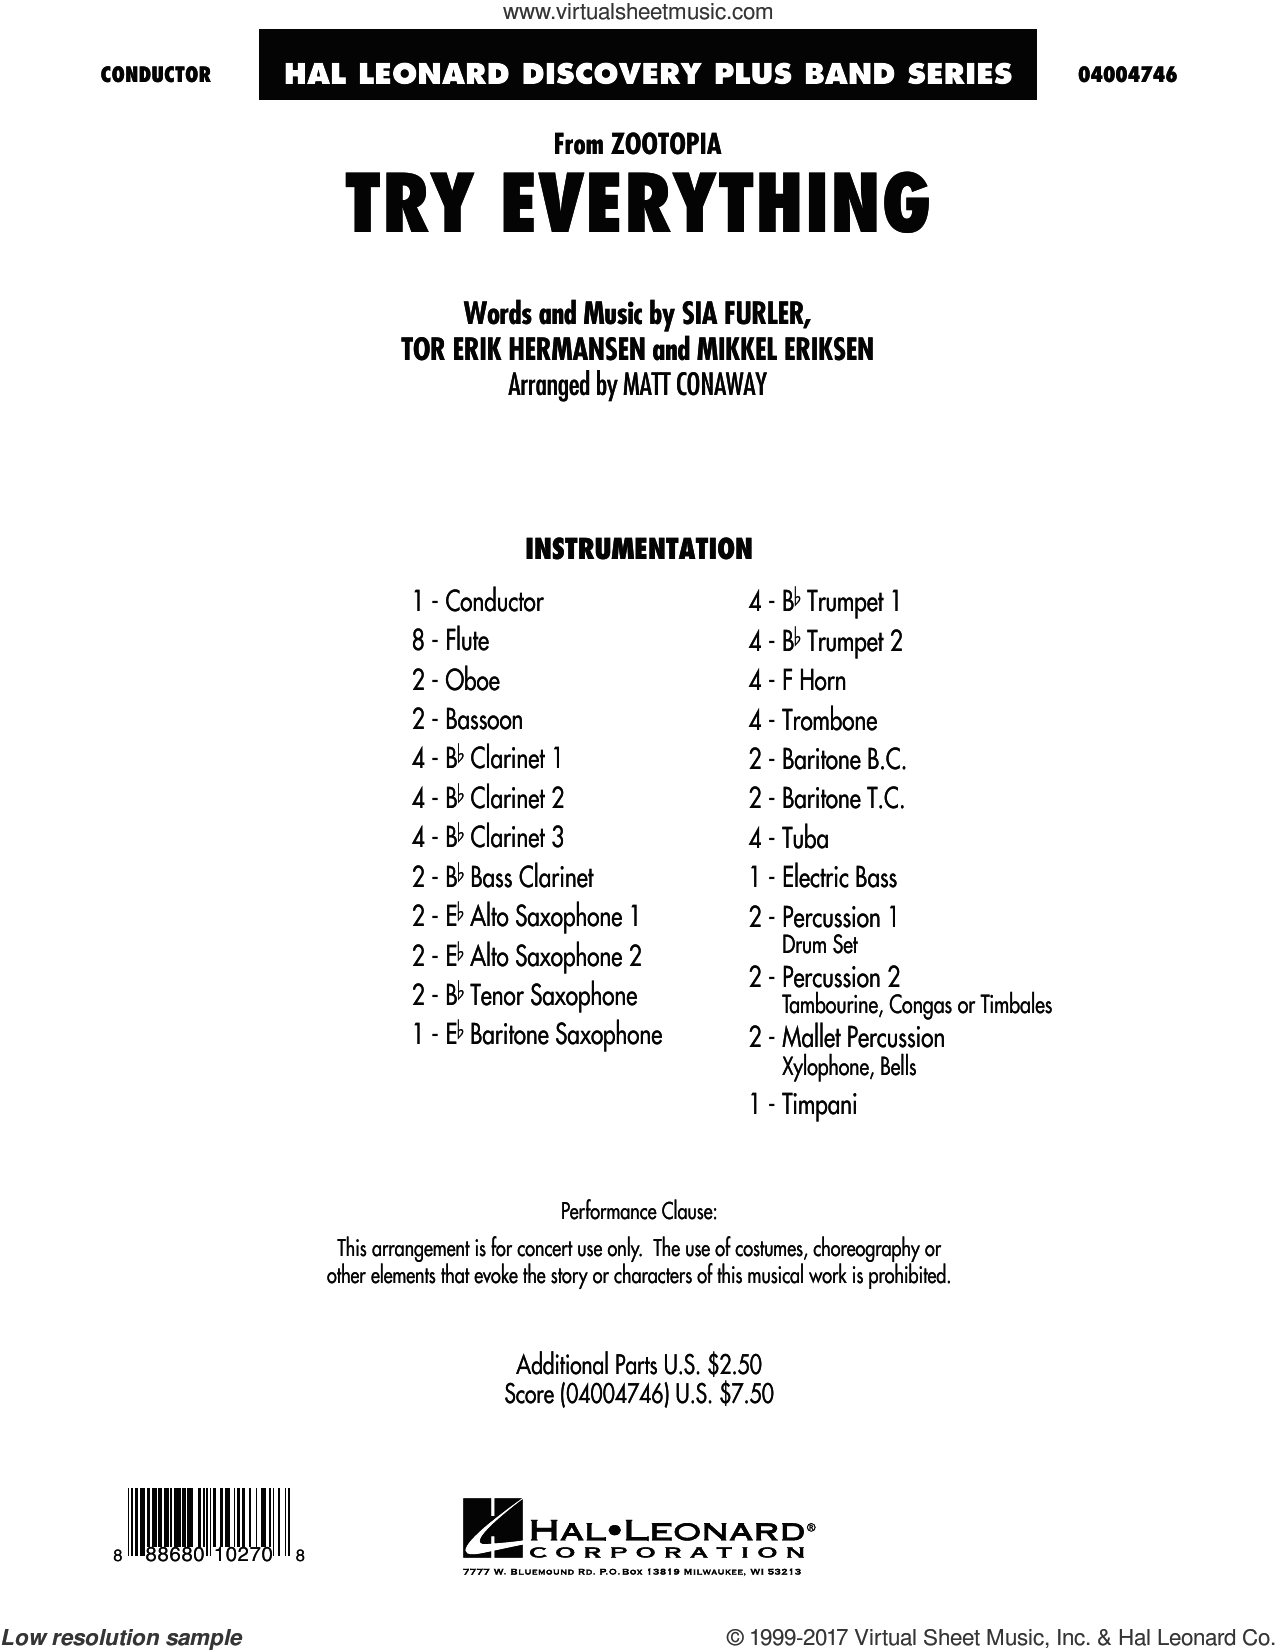 Try Everything (from Zootopia) (COMPLETE) sheet music for concert band by Matt Conaway, Mikkel Eriksen, Shakira, Sia Furler and Tor Erik Hermansen, intermediate skill level